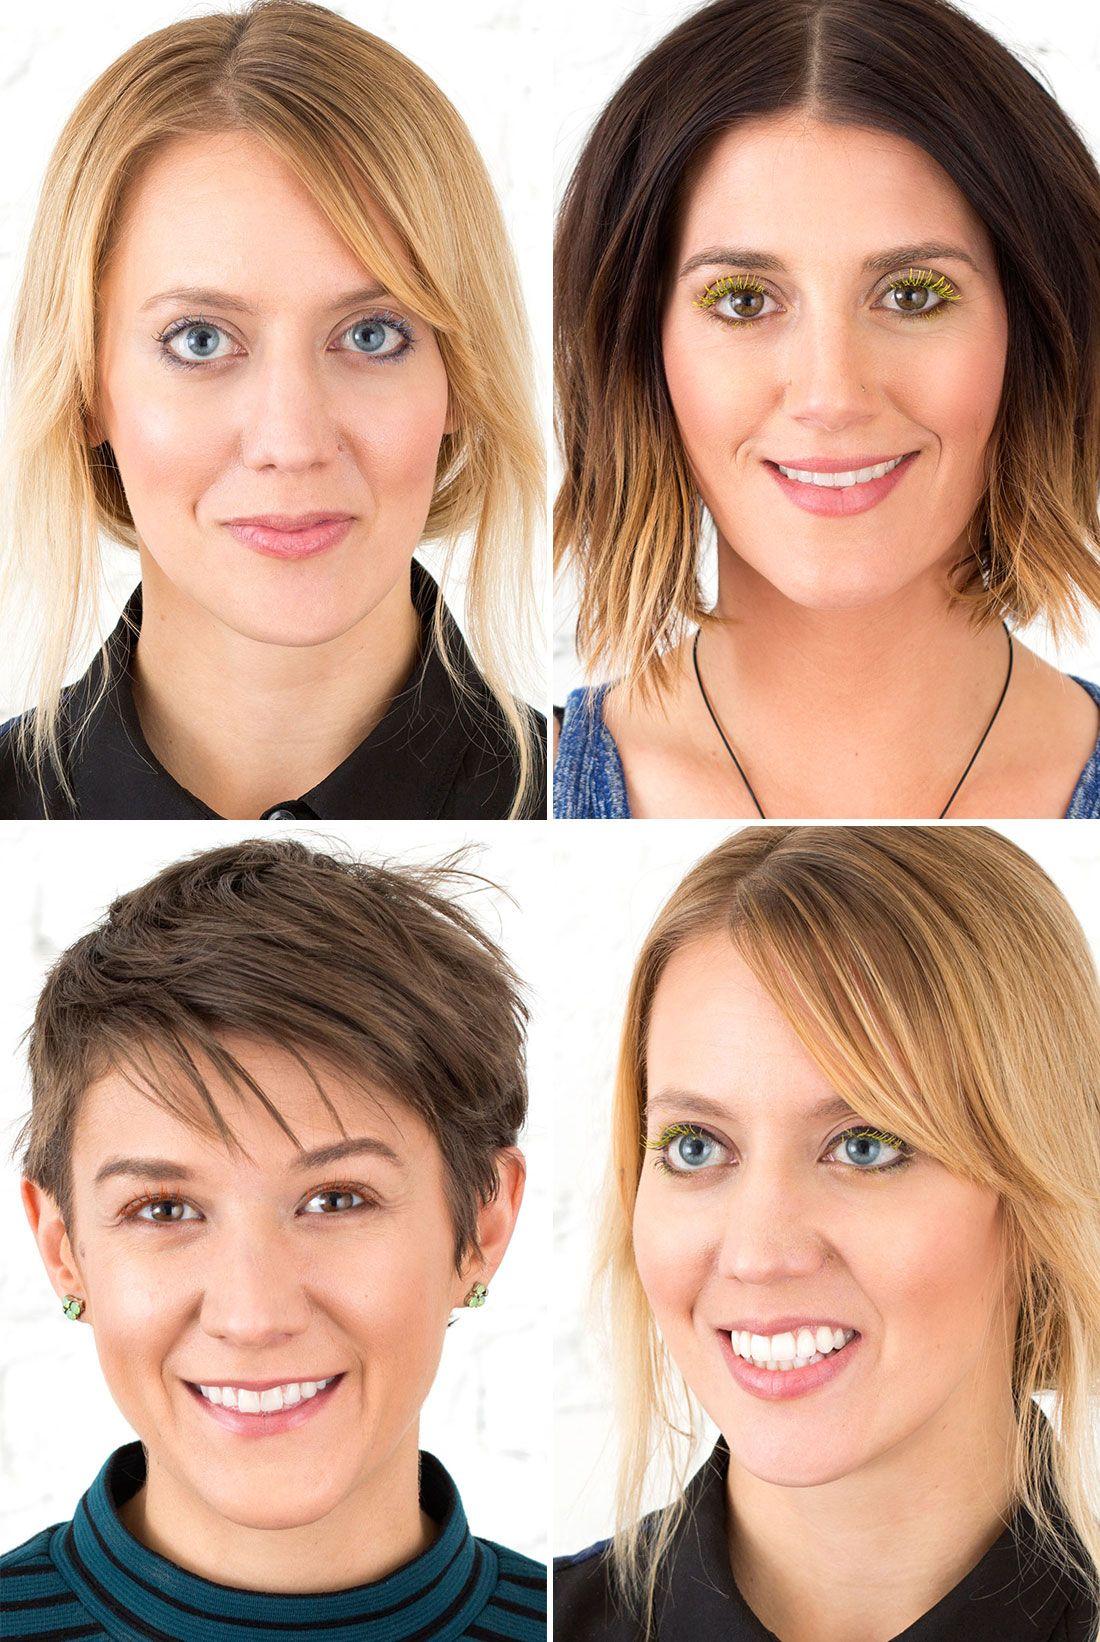 2 Ways to DIY Colored Mascara + 6 Ways To Rock It via Brit + Co.